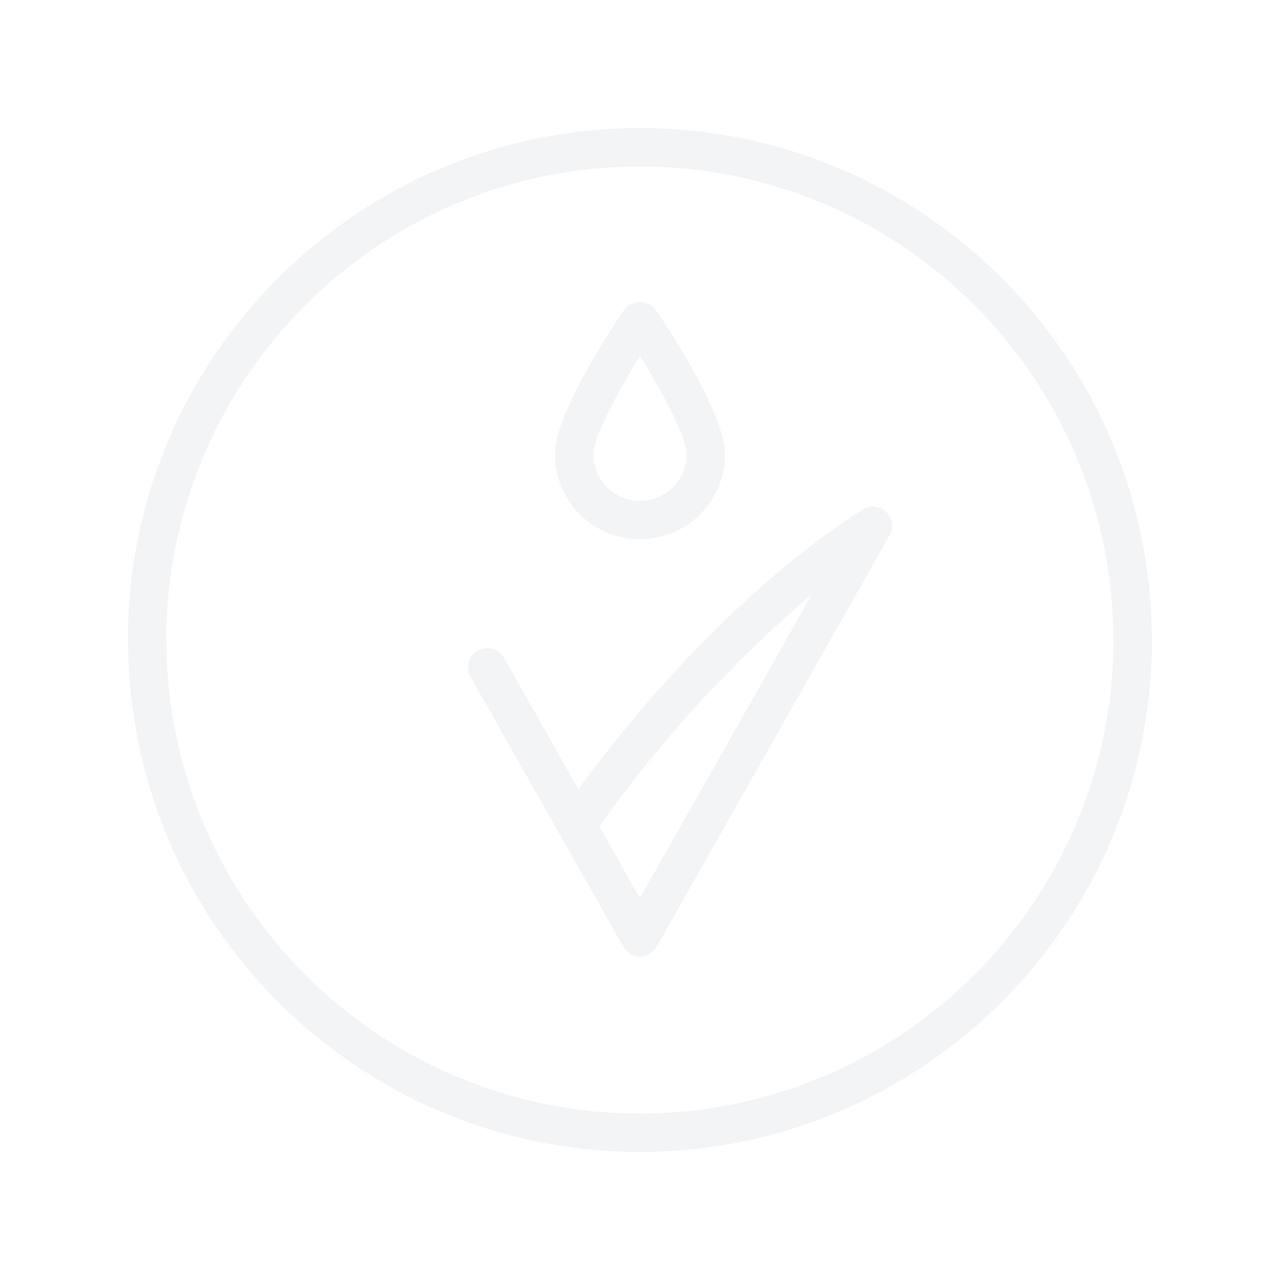 HUGO BOSS The Scent Parfum Edition EDP 100ml